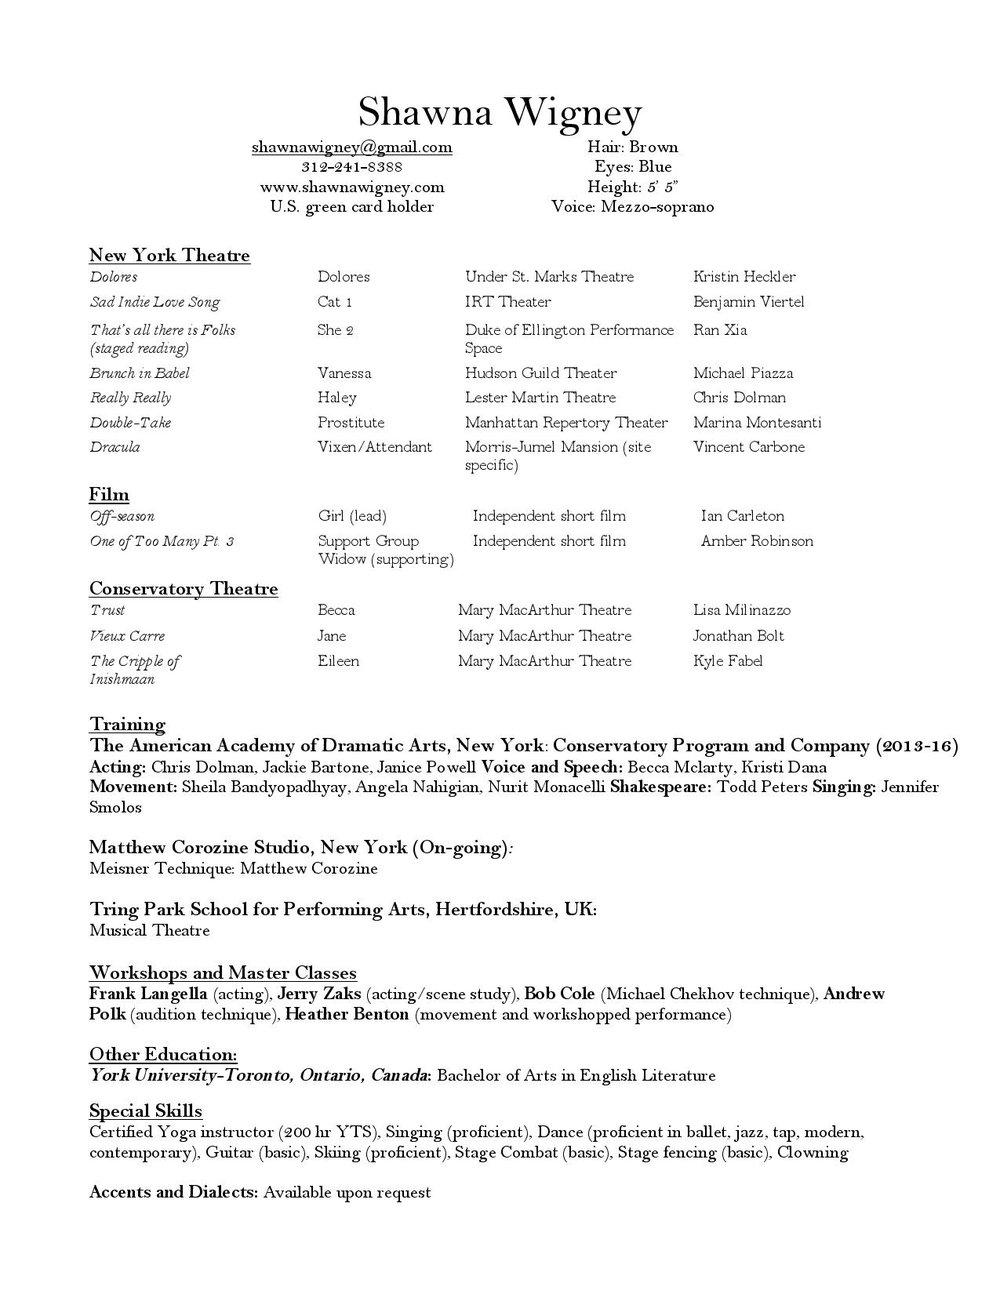 Shawna final acting resume pdf-page-001.jpg